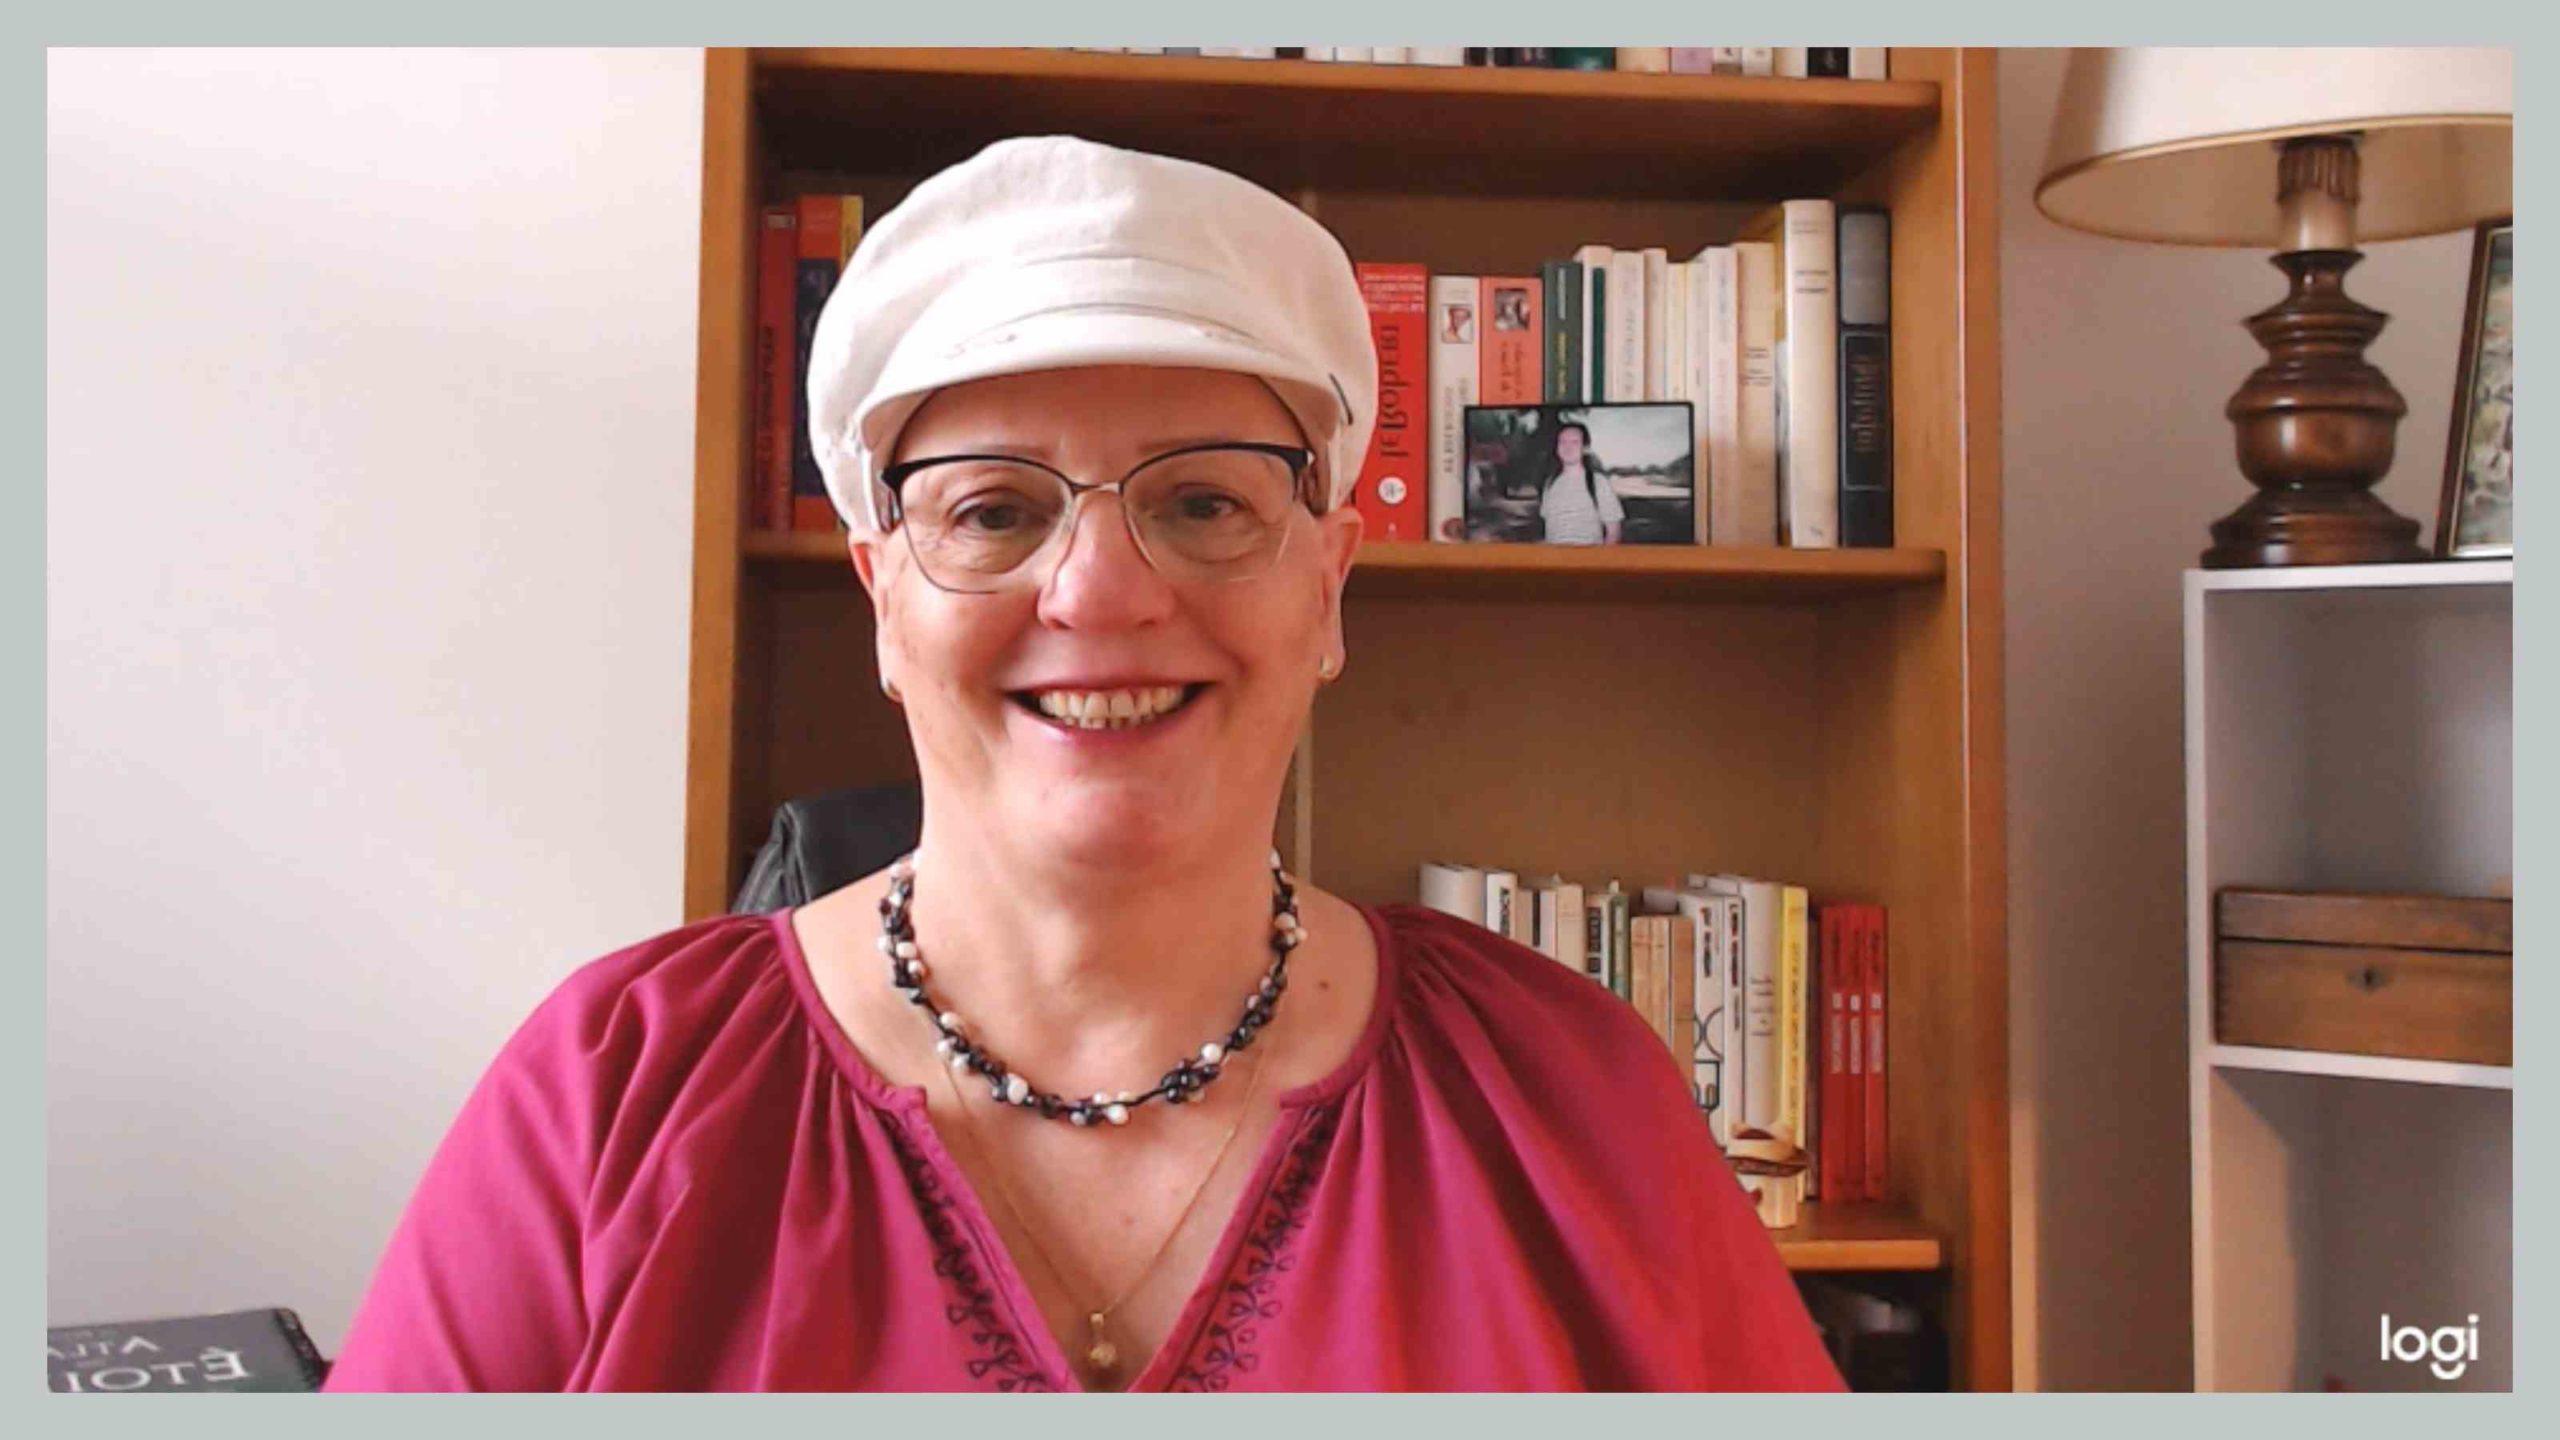 Helene Hug biographie